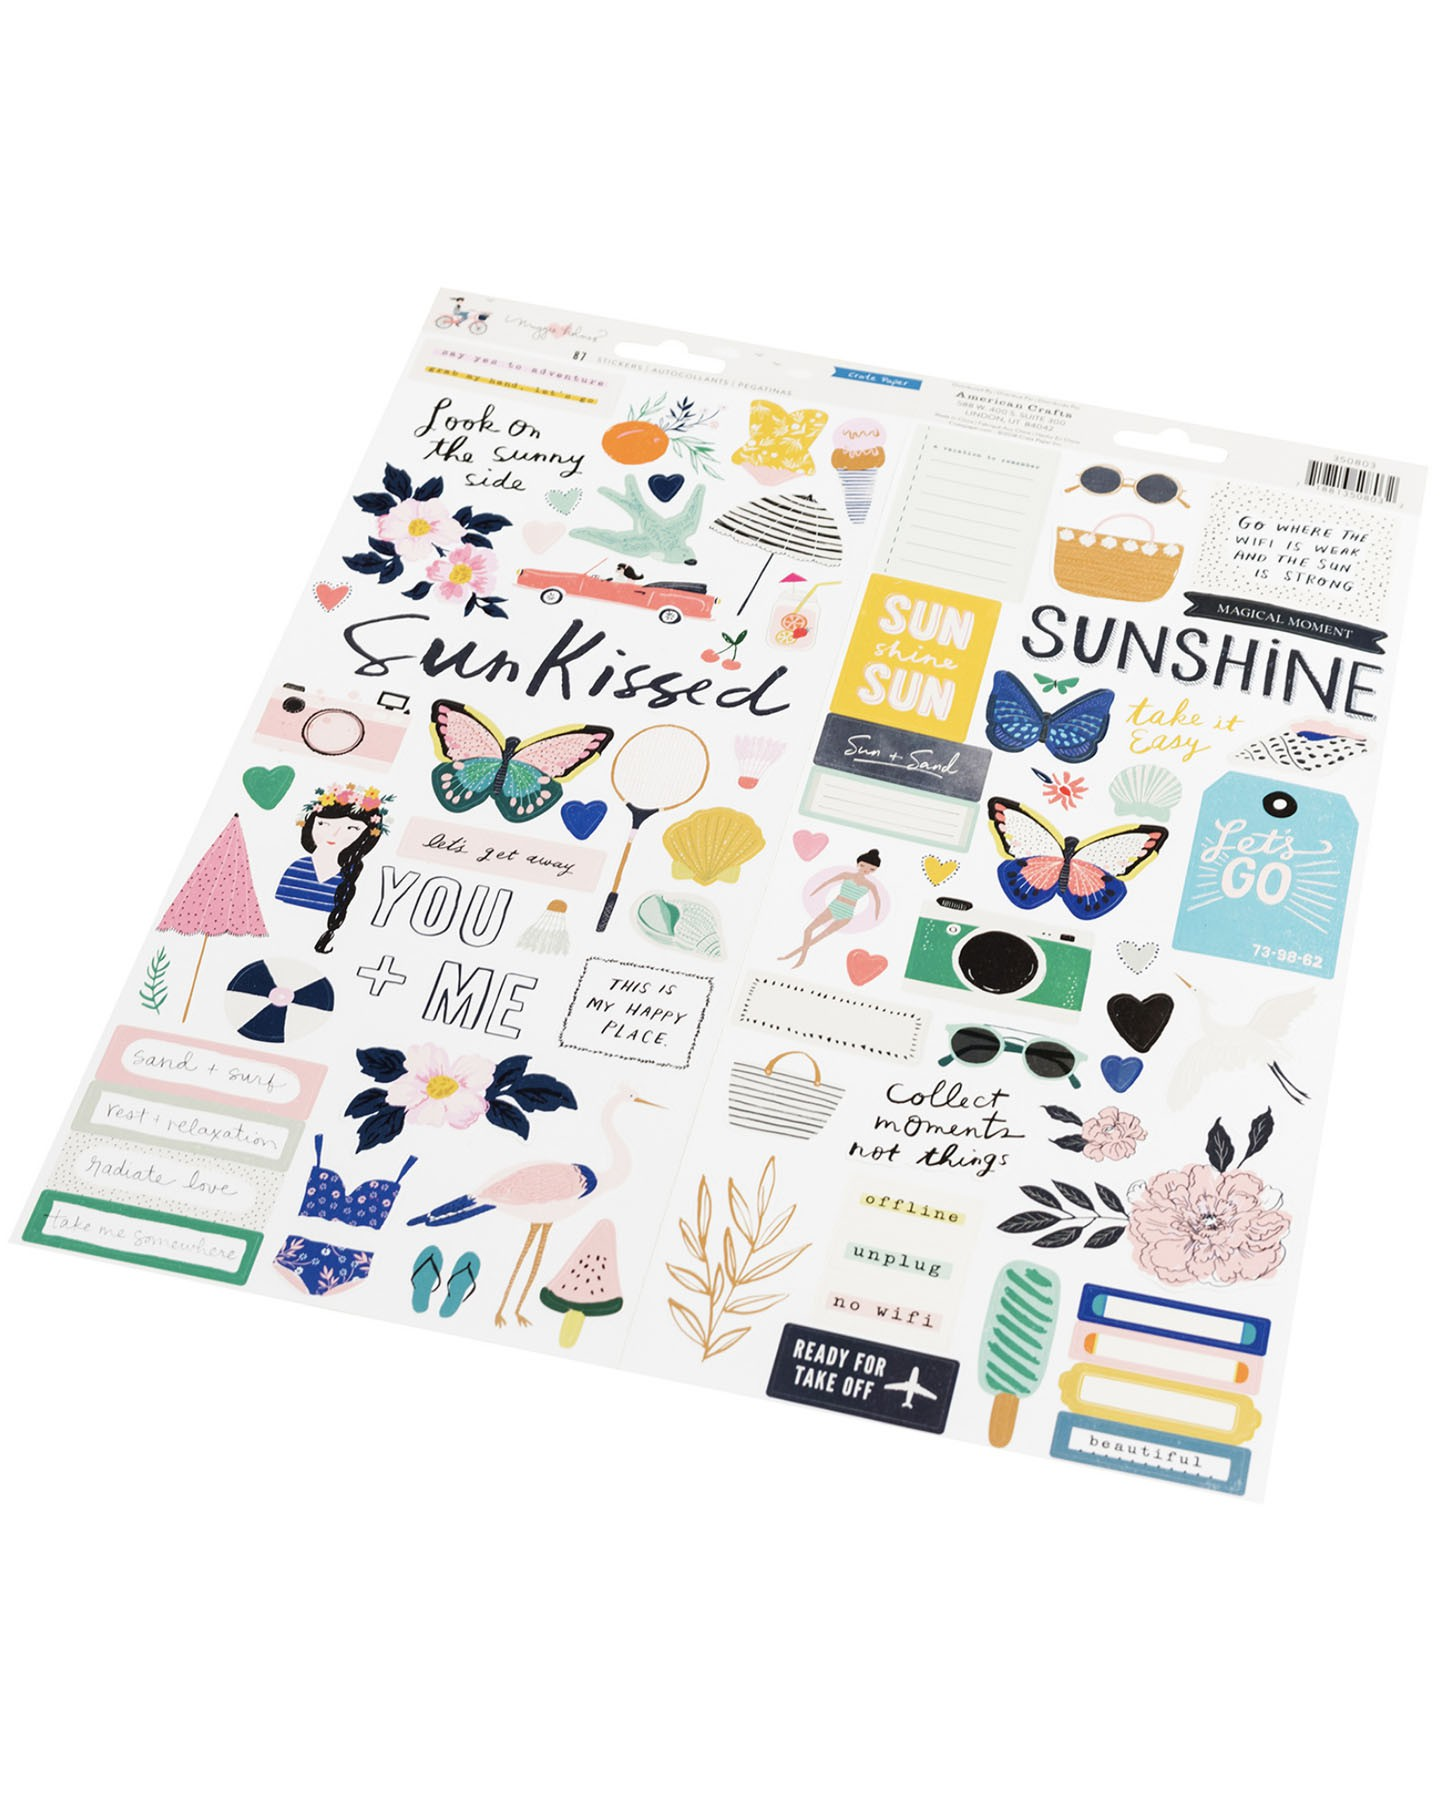 Adesivos - Sun kissed Crate Paper